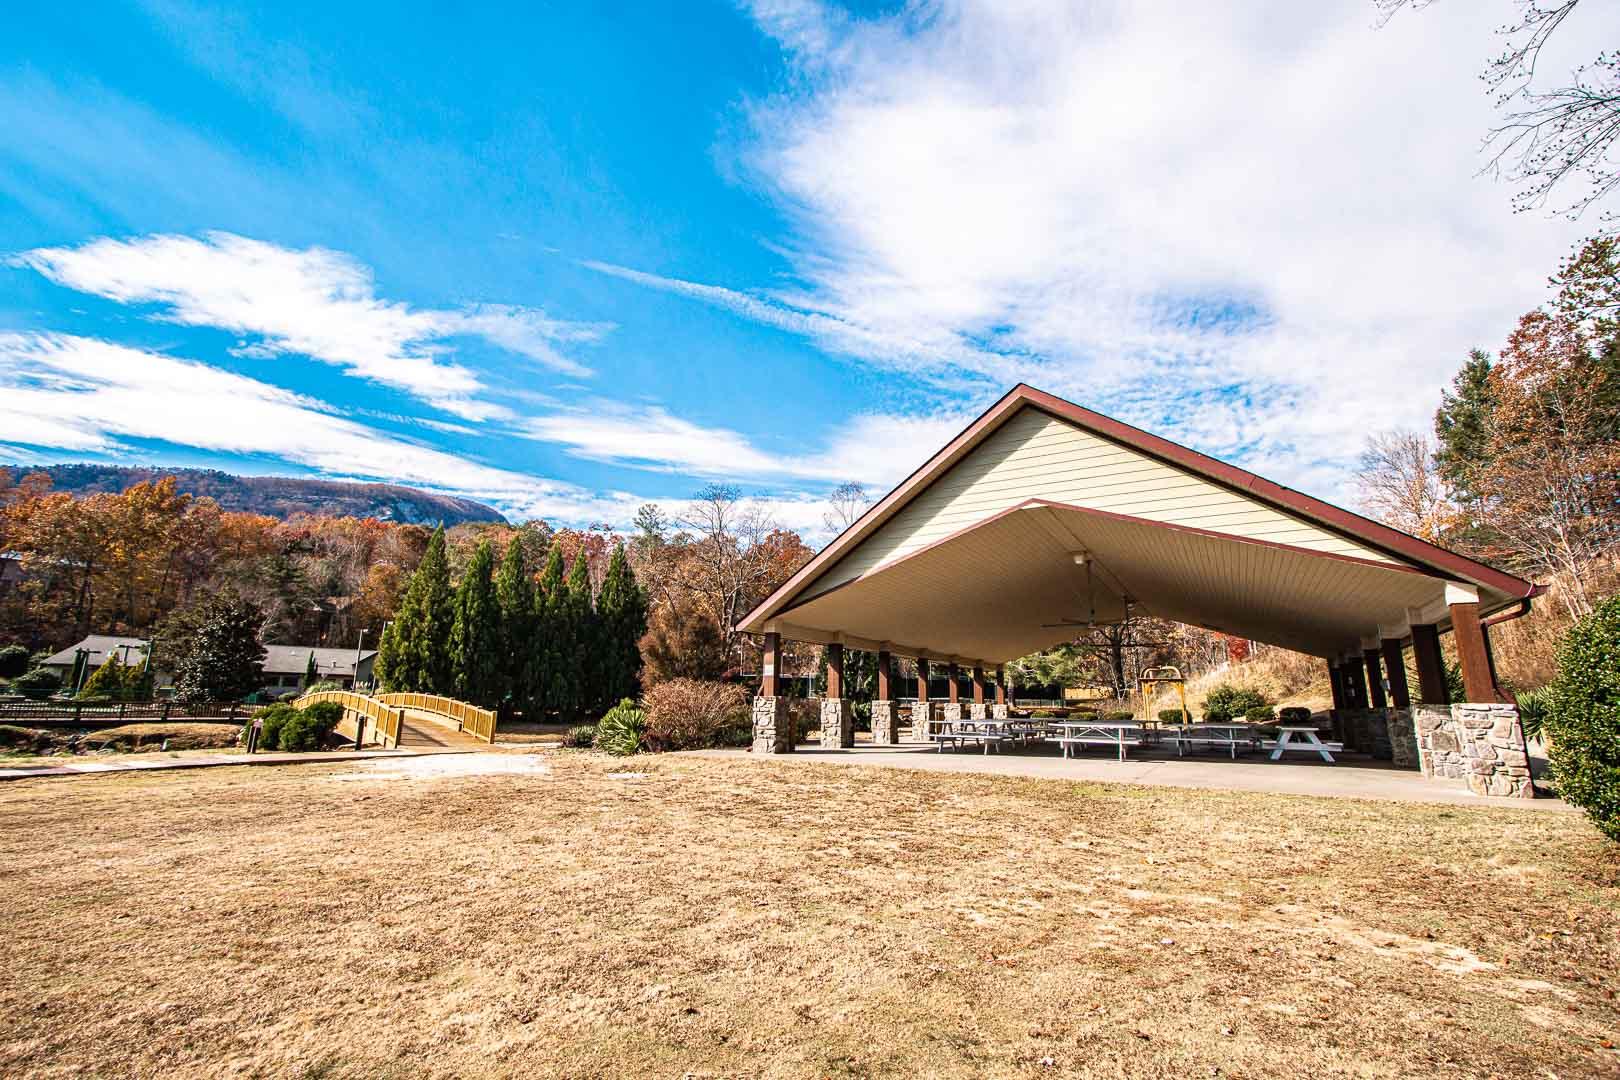 A spacious picnic area at VRI's Mountain Loft Resort in North Carolina.